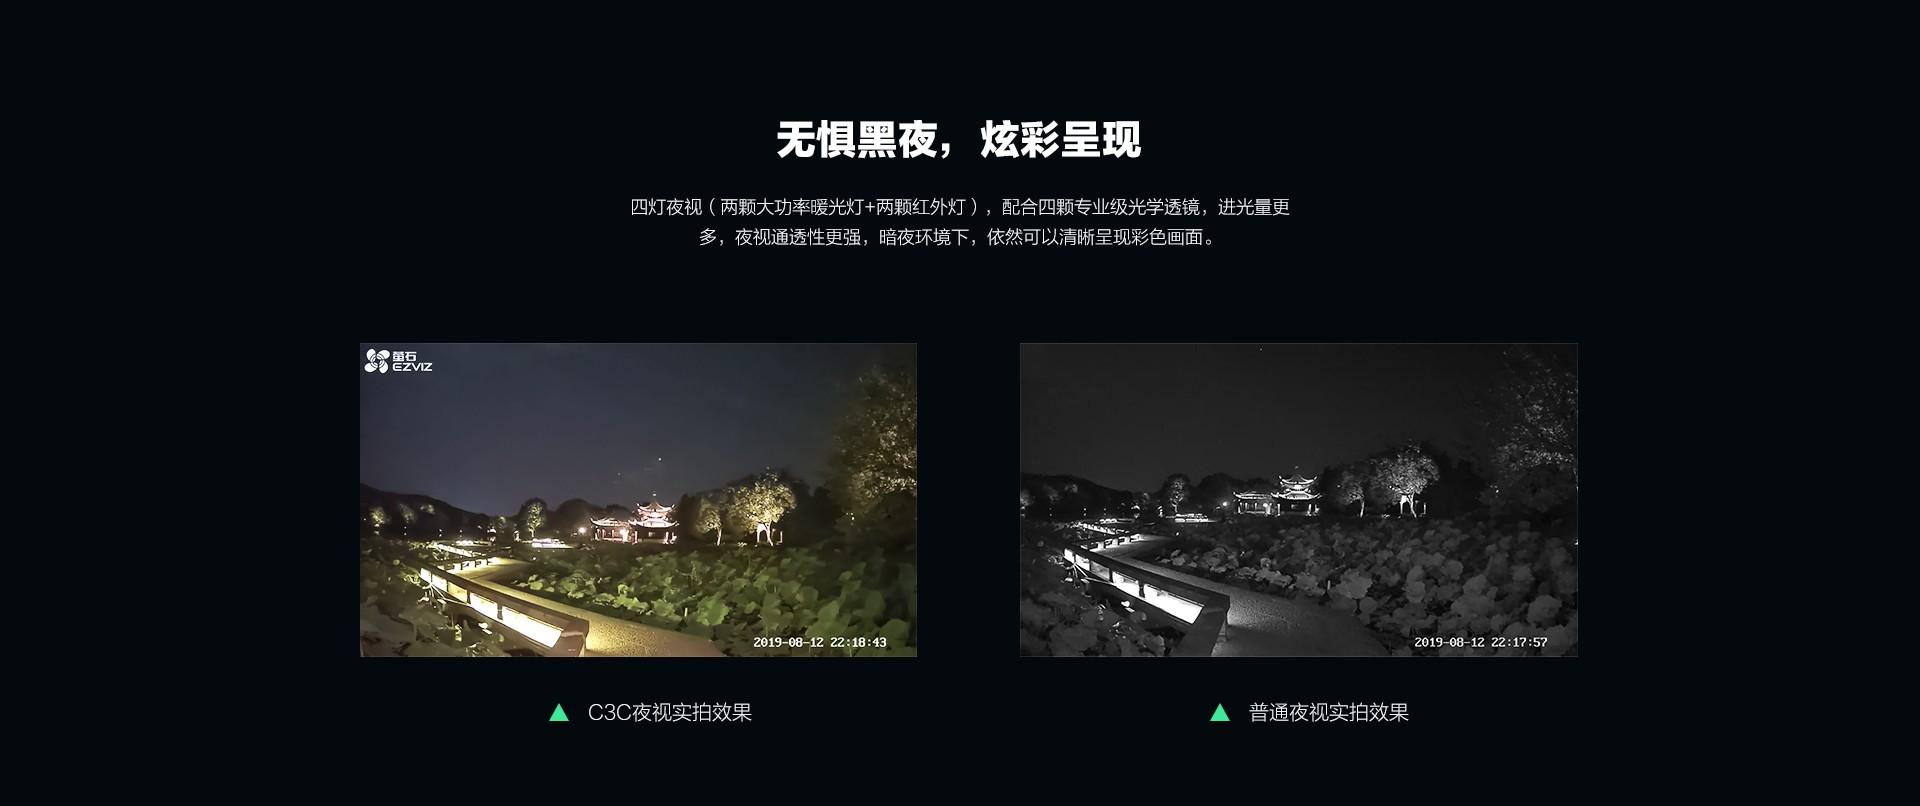 C3CPOE+X5SC-web_15.jpg